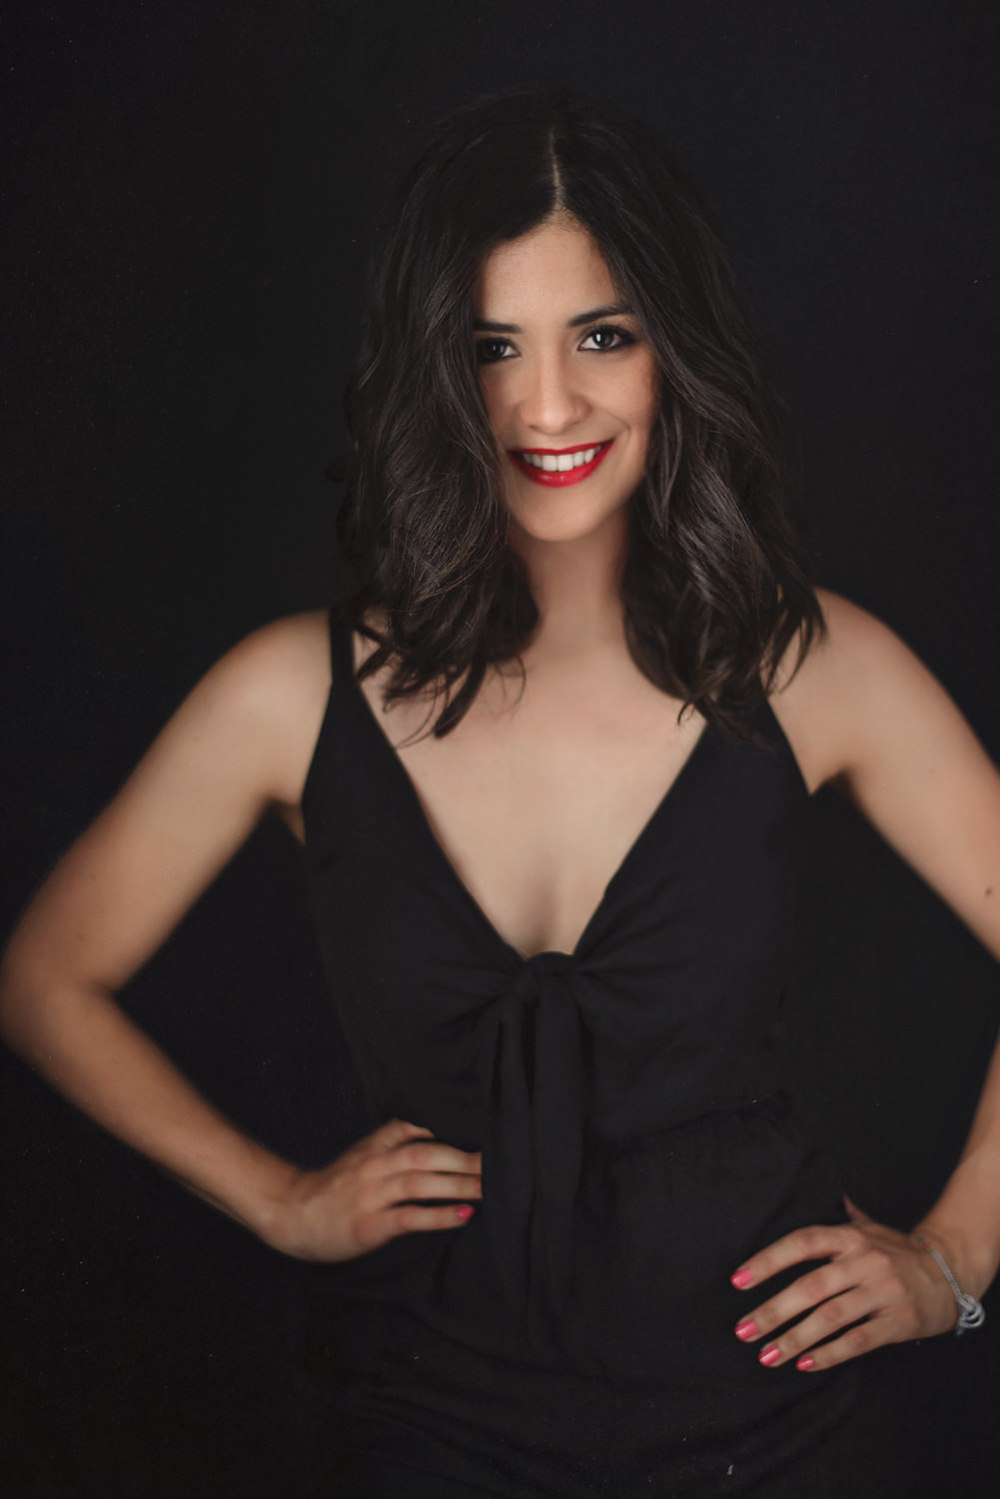 Sesion-fotos-mexicali-retrato-el-mundo-de-fa-jumpsuit-negro-cover-girl-pose